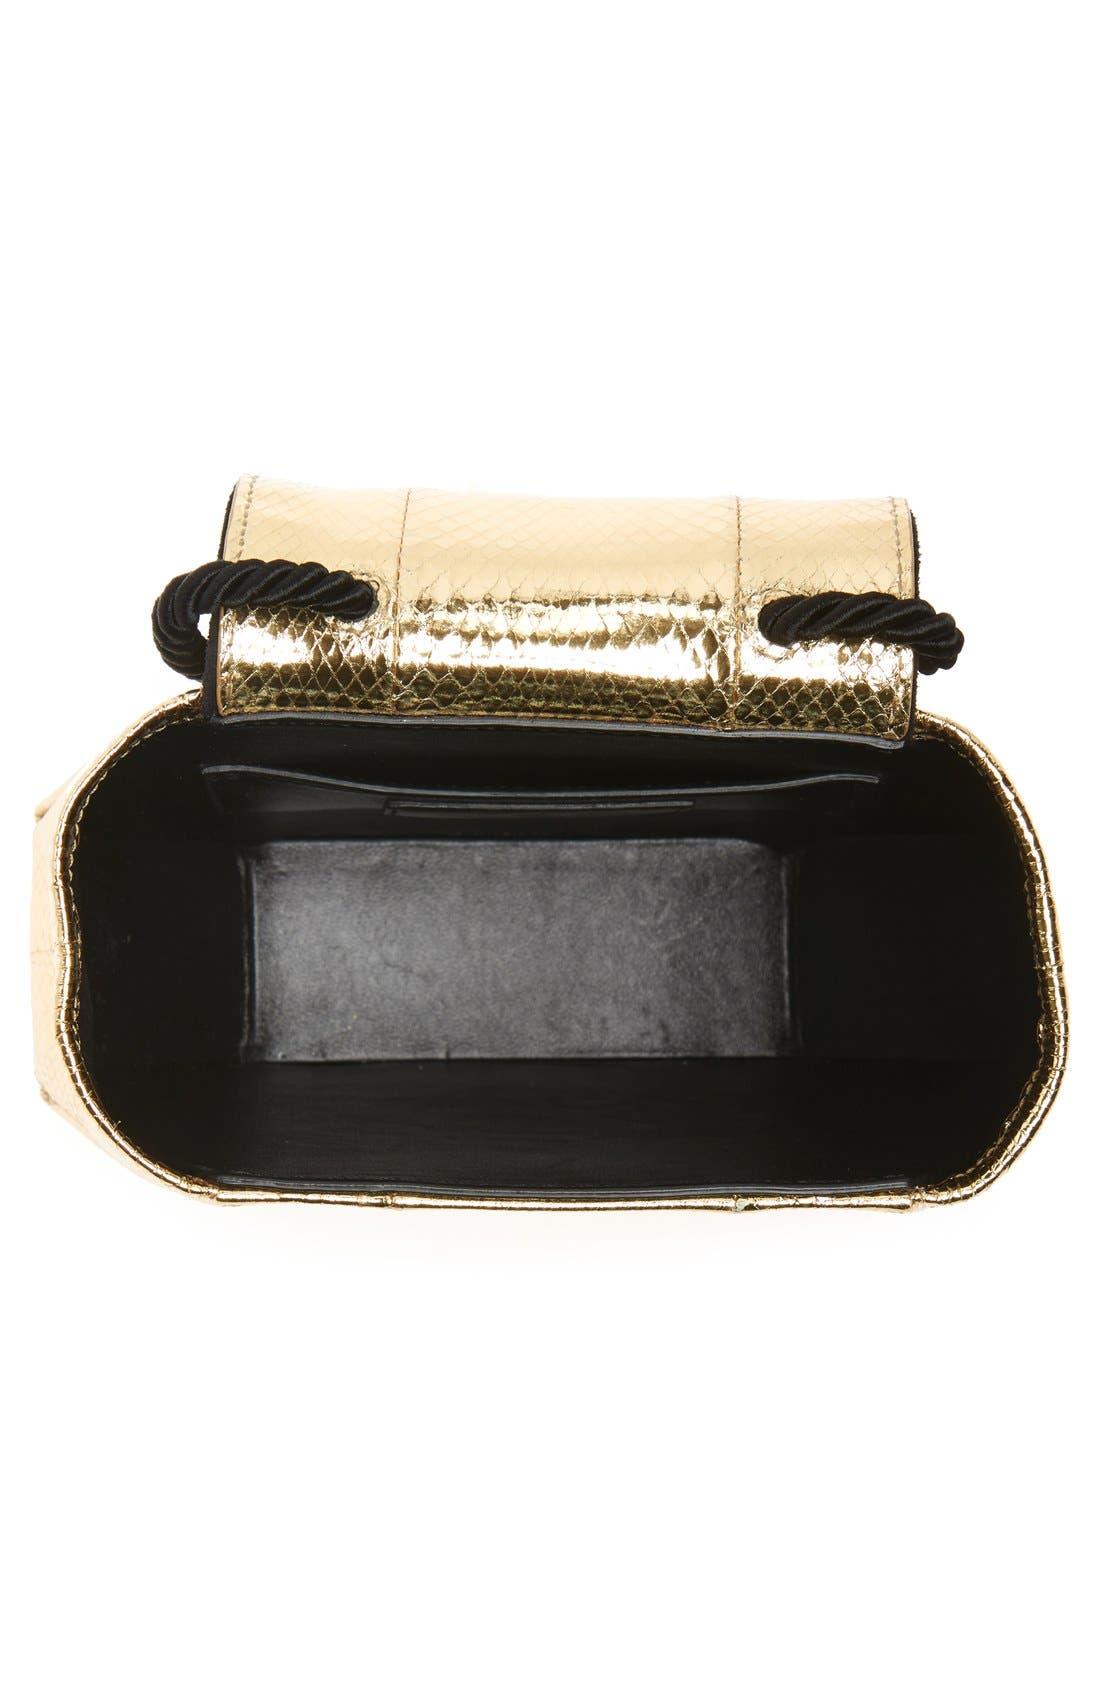 'Opium' Genuine Snakeskin & Leather Saddle Bag,                             Alternate thumbnail 6, color,                             716